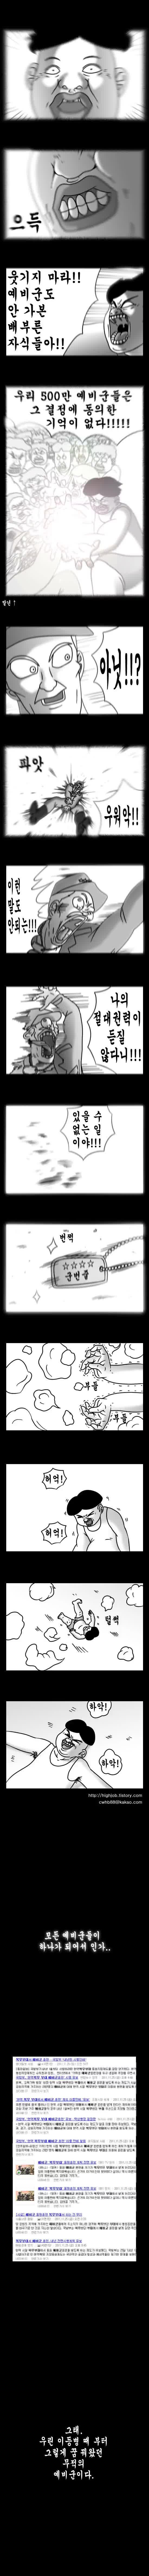 Watch and share 실화였던 예비군 만화 GIFs by podong on Gfycat